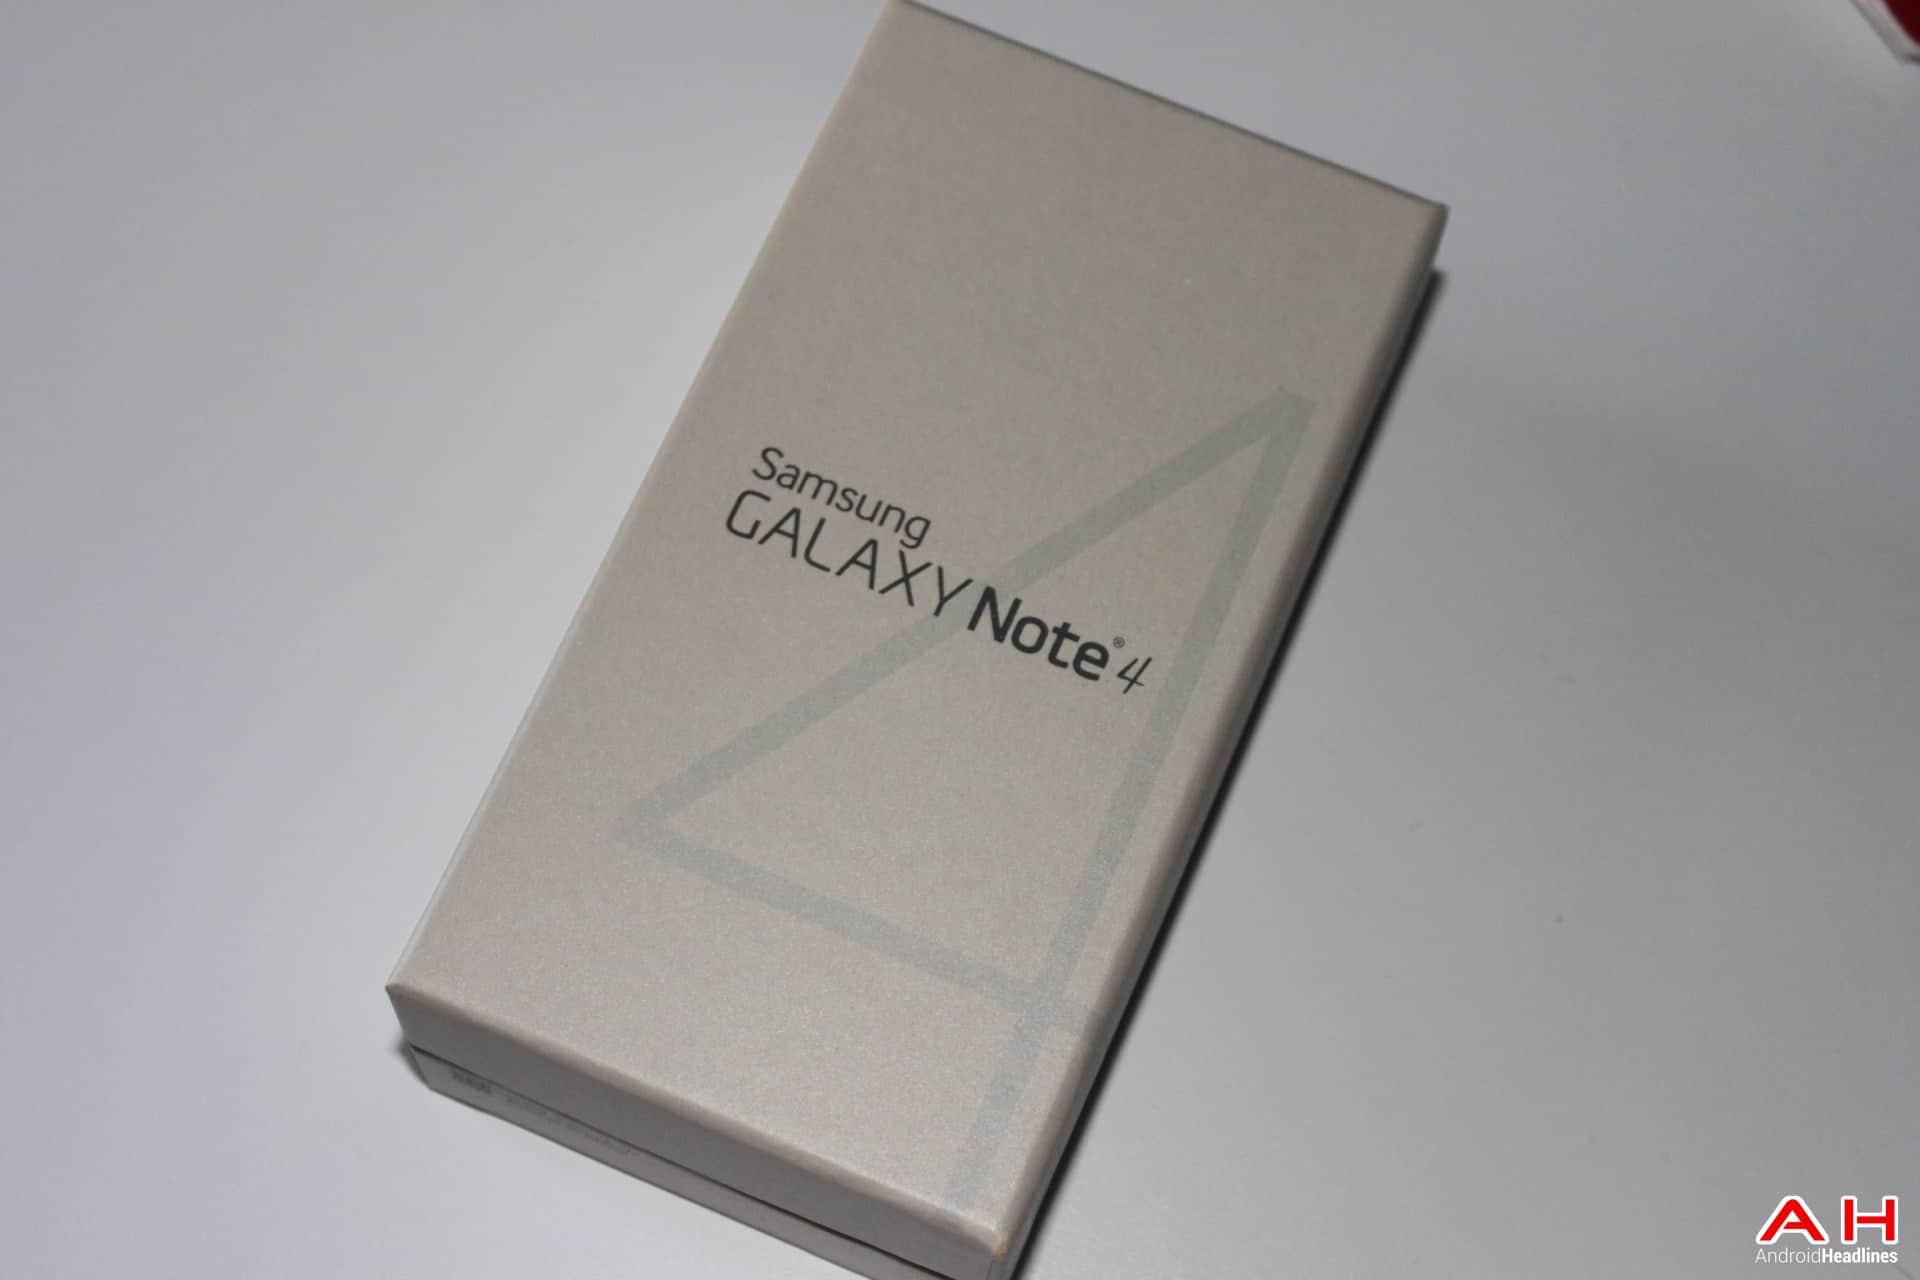 AH Samsung Galaxy Note 4 1